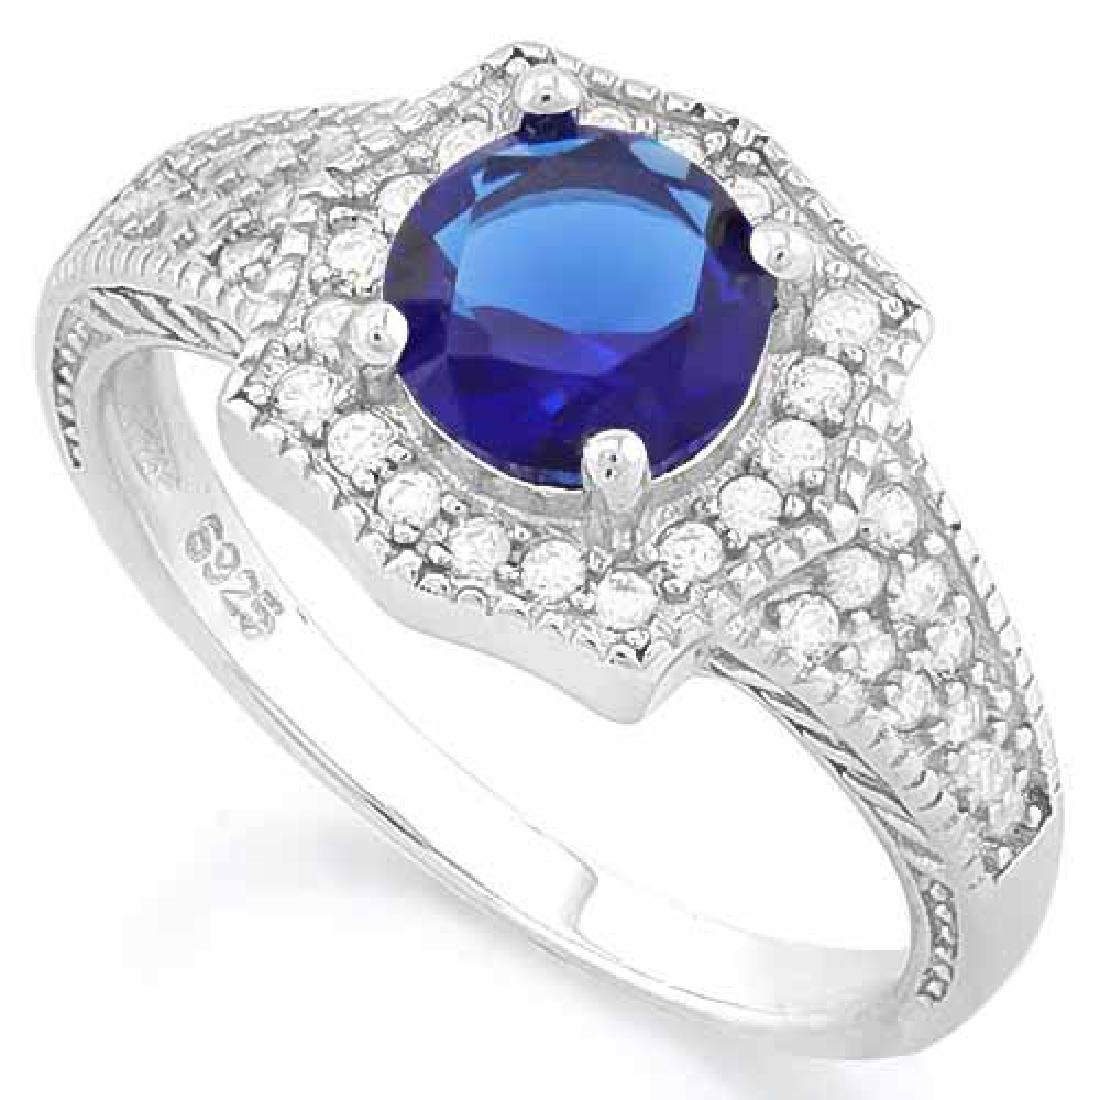 1 1/5 CARAT CREATED BLUE SAPPHIRE & 2/5 CARAT (40 PCS)